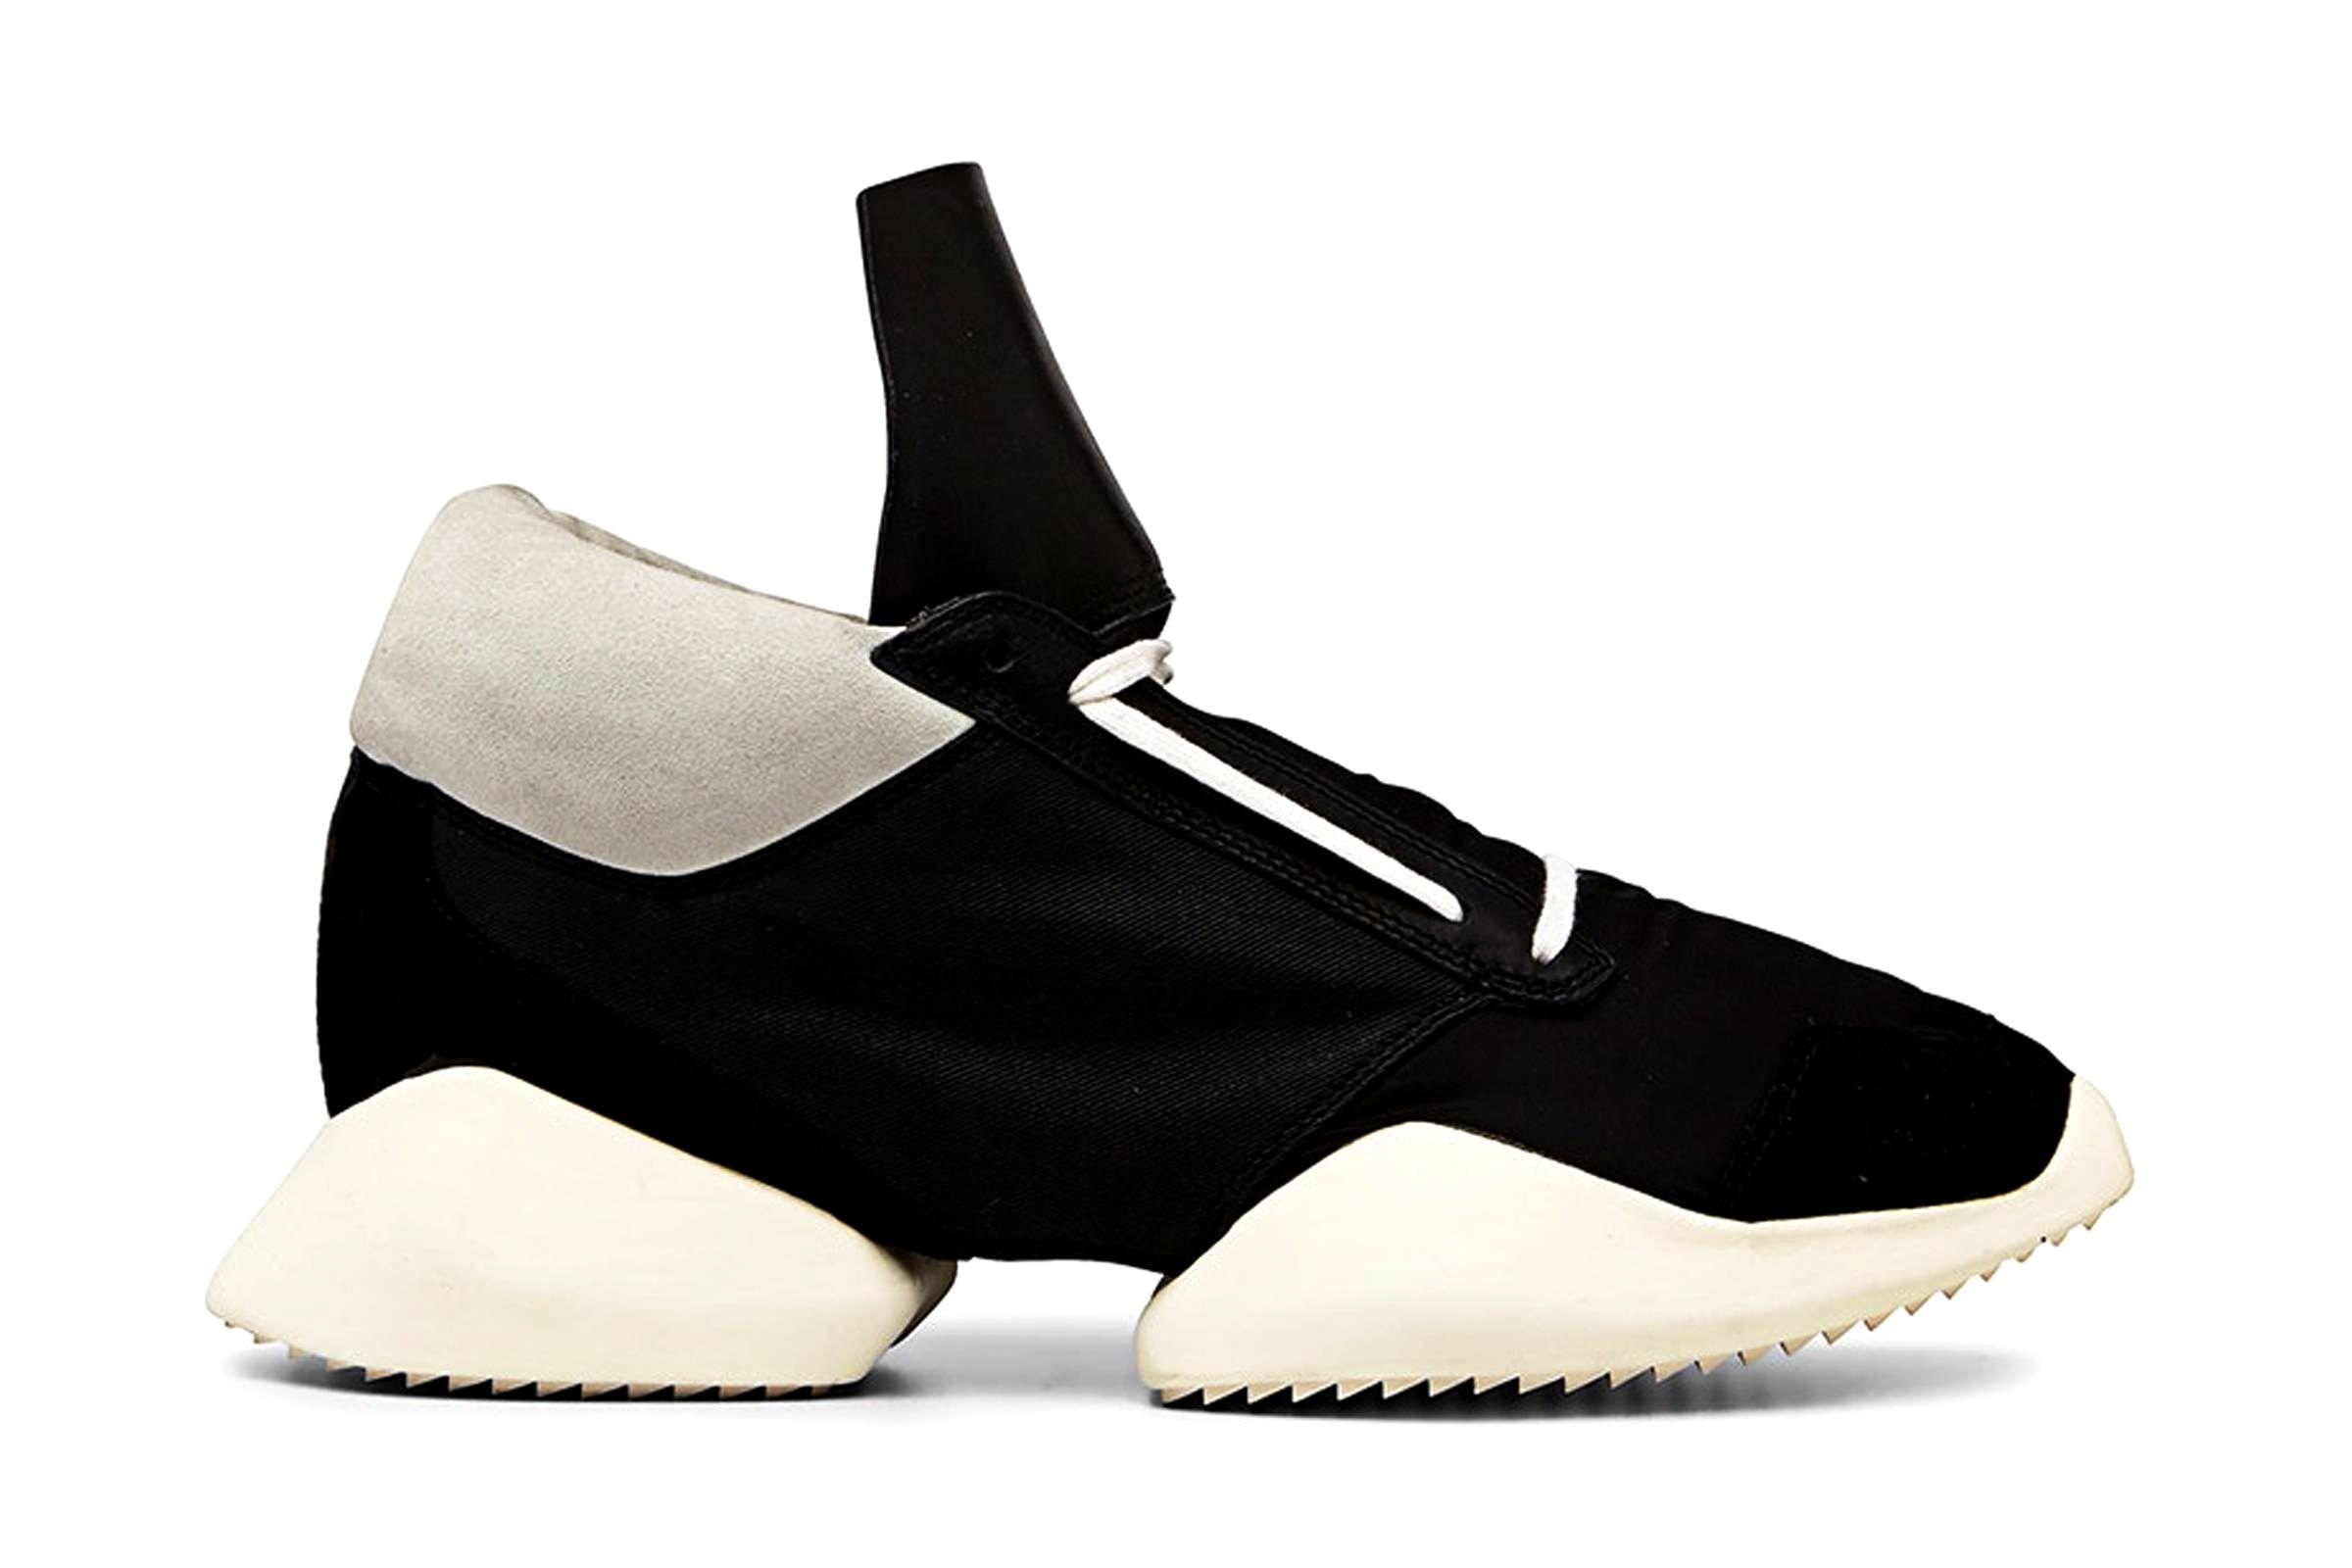 7adebea4dcb3 Конец эпохи  история adidas by Rick Owens   Молодежный Центр